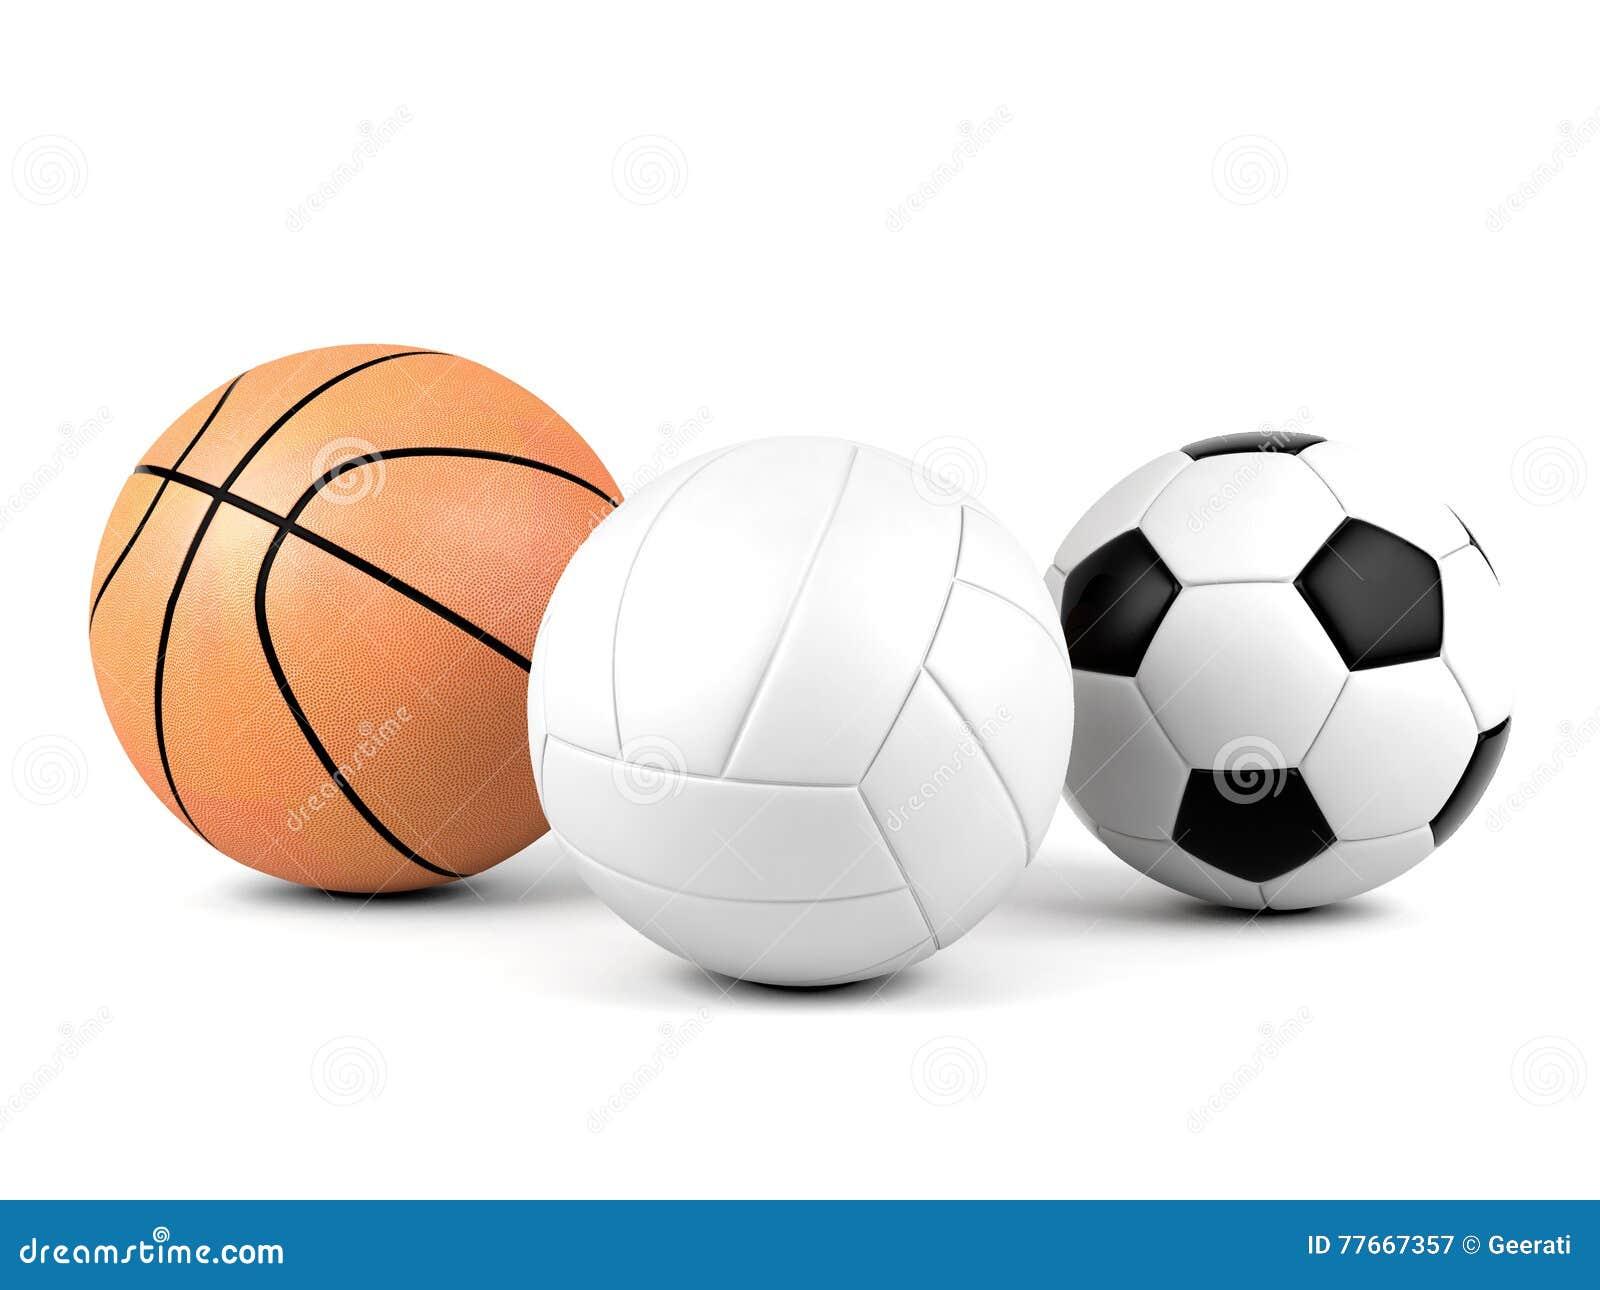 Volleyball, soccer ball, basketball, sport balls on white background